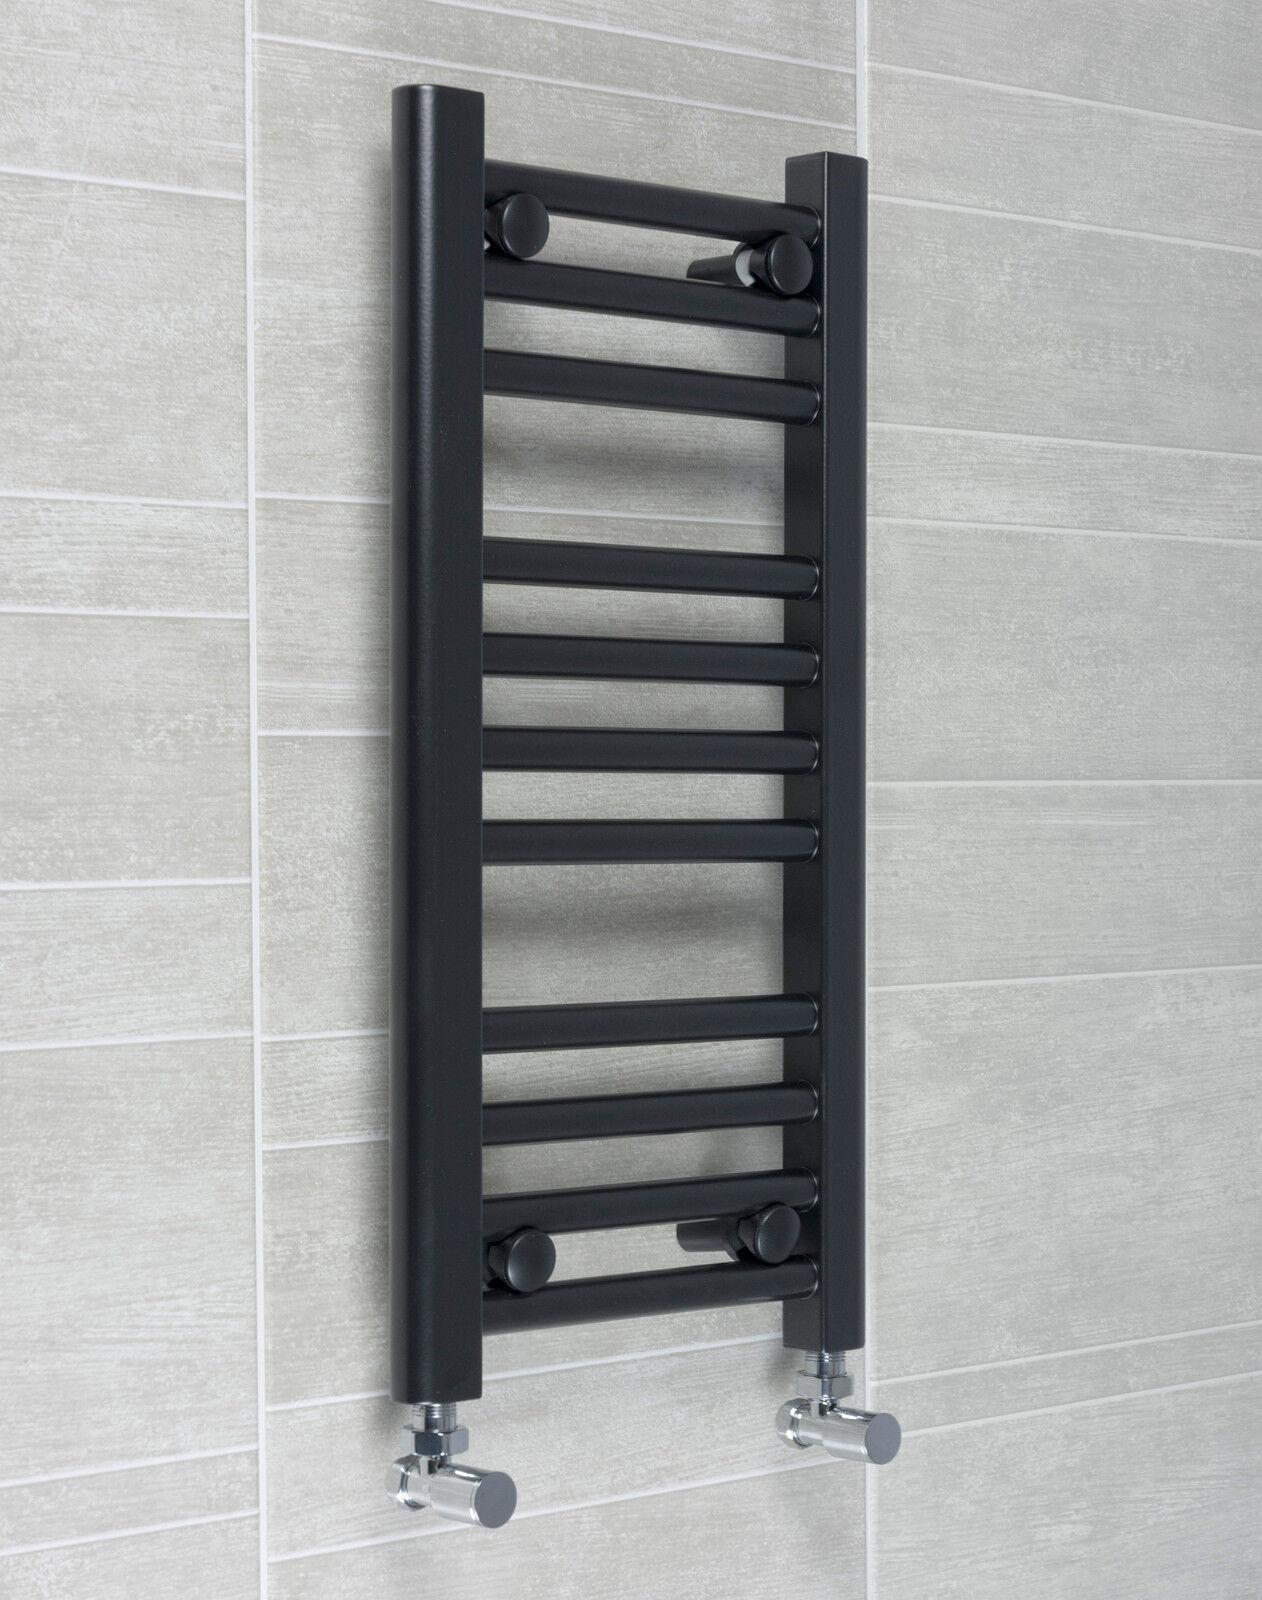 300mm wide black designer electric heated towel rail radiator straight bathroom ebay for Electric heated towel rails for bathrooms